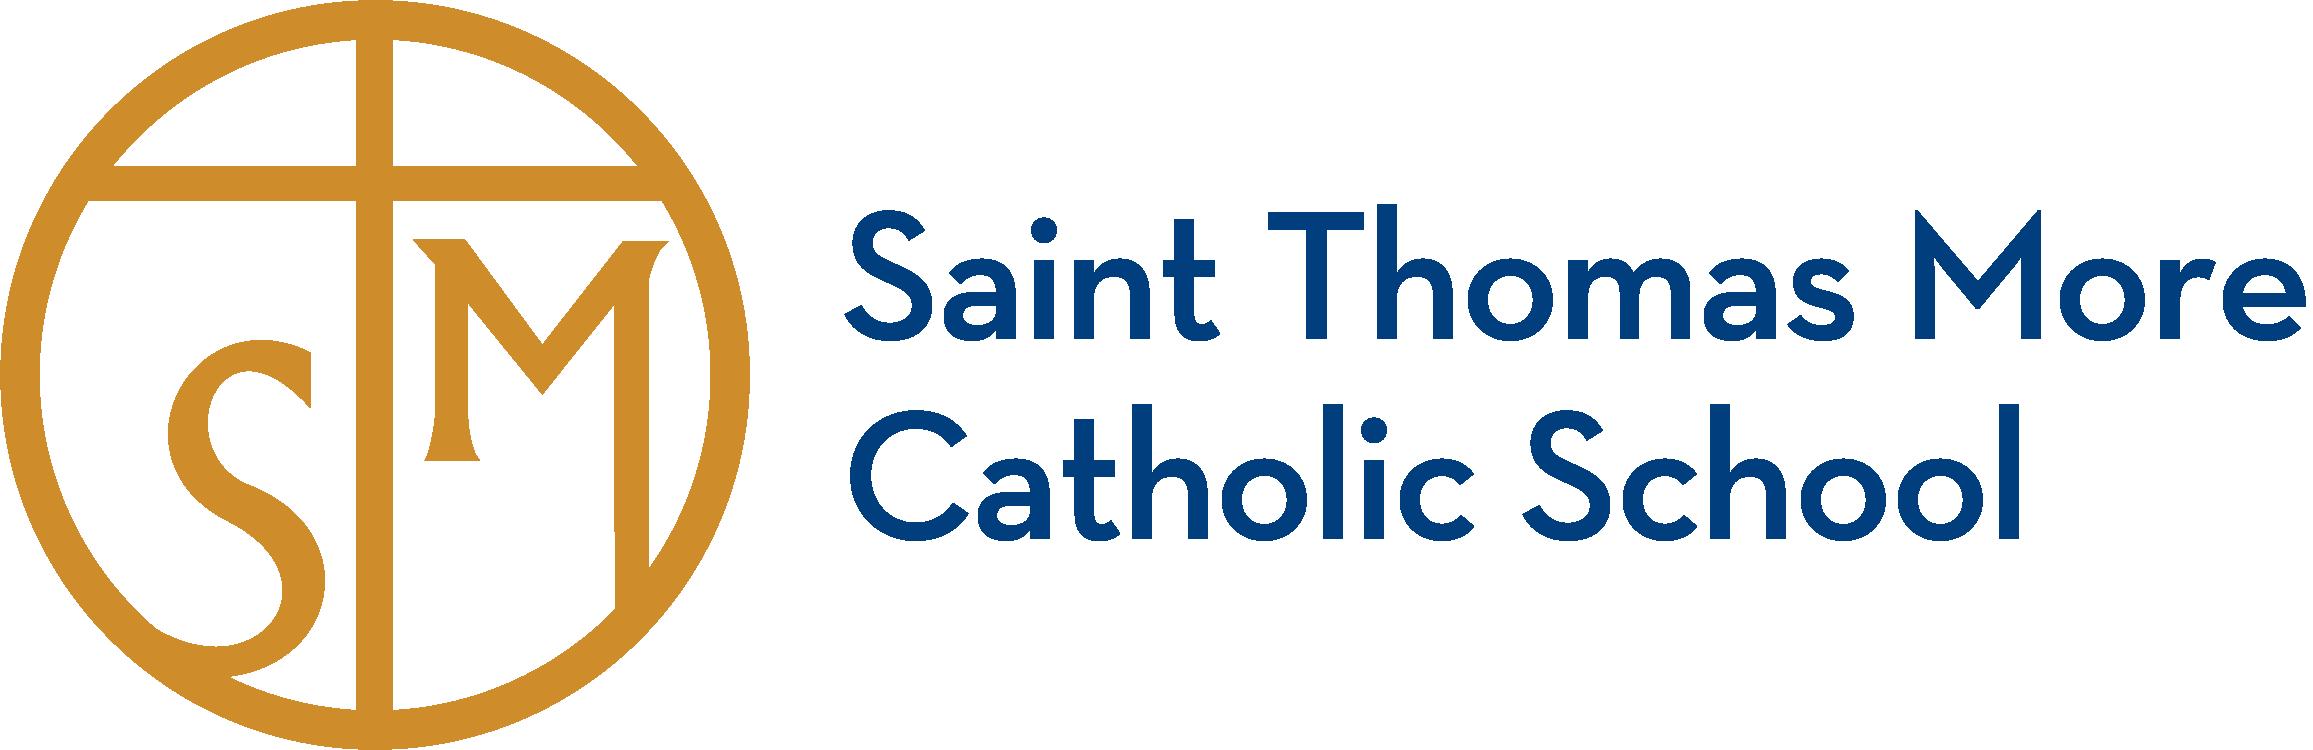 Saint Thomas More Catholic School Company Logo